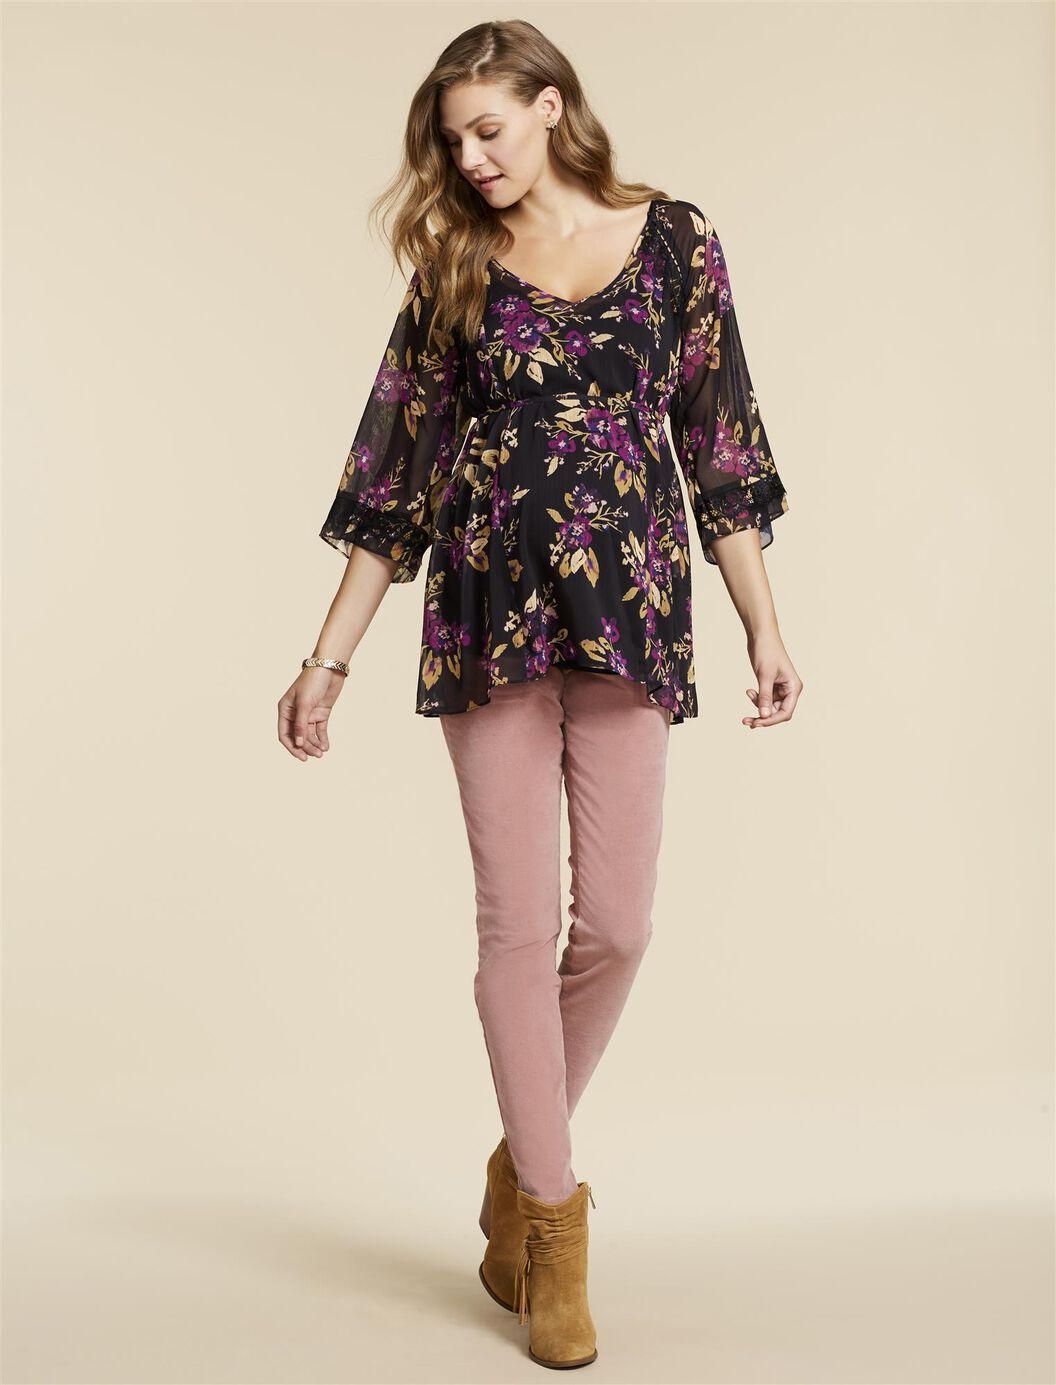 Jessica Simpson Secret Fit Belly Corduroy Skinny Leg Maternity Pants at Motherhood Maternity in Victor, NY | Tuggl